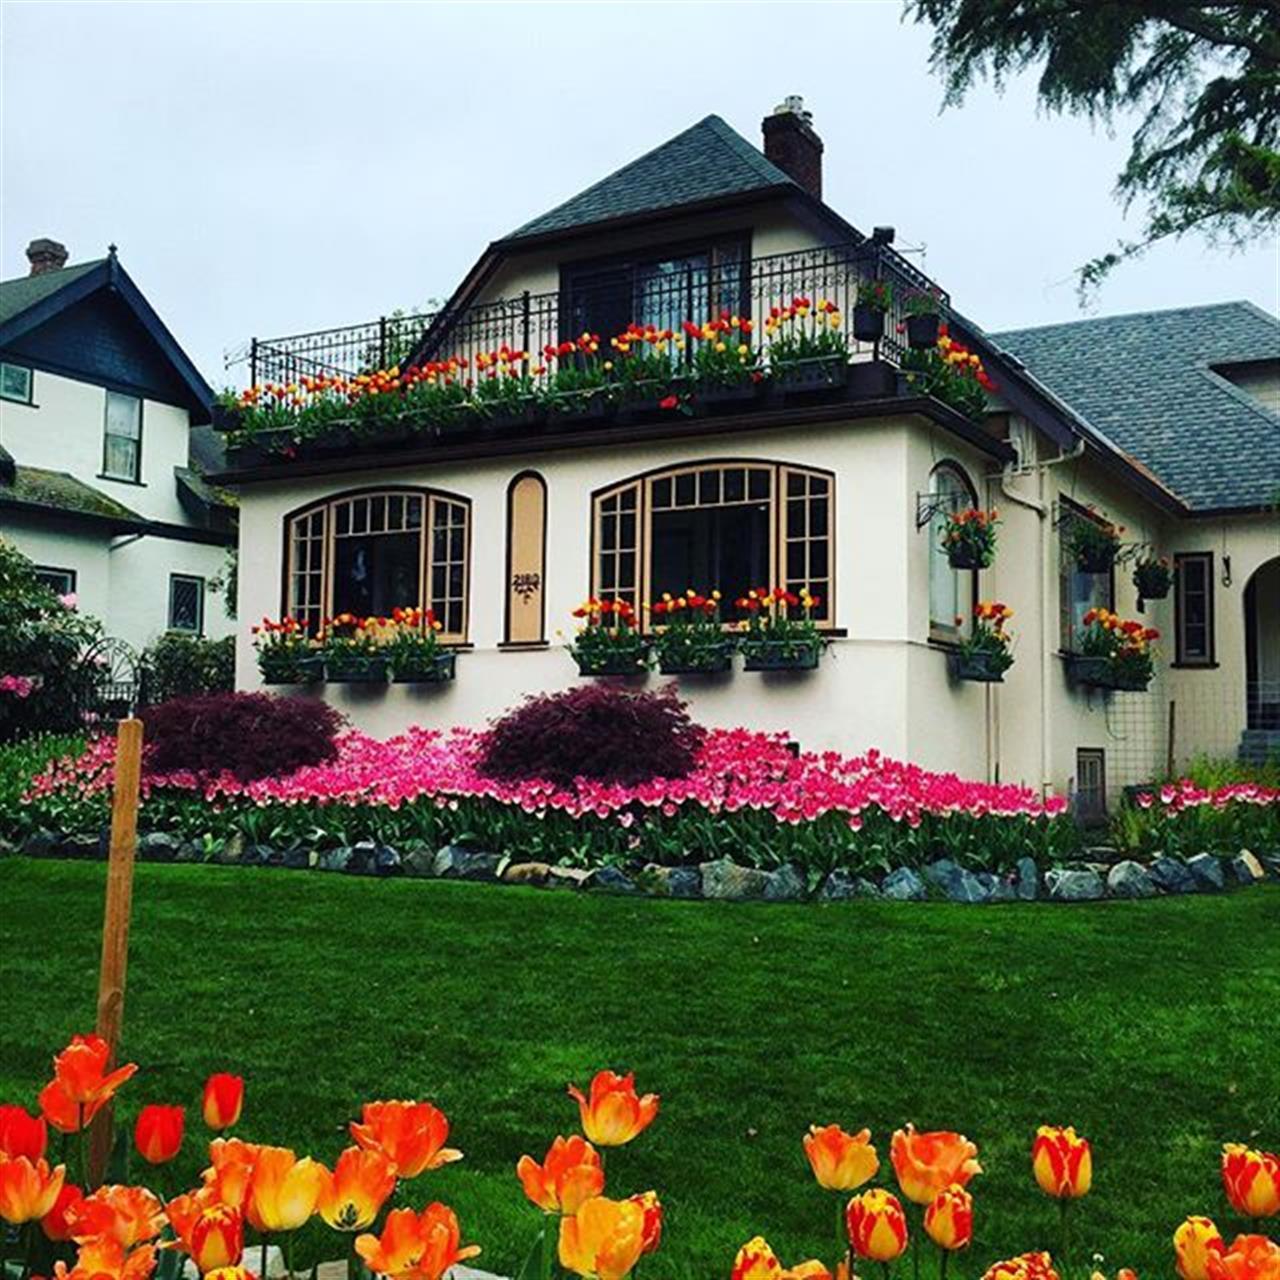 #oakbay #flowerpower #beachdr #realtor #LeadingRElocal #spring #tulips